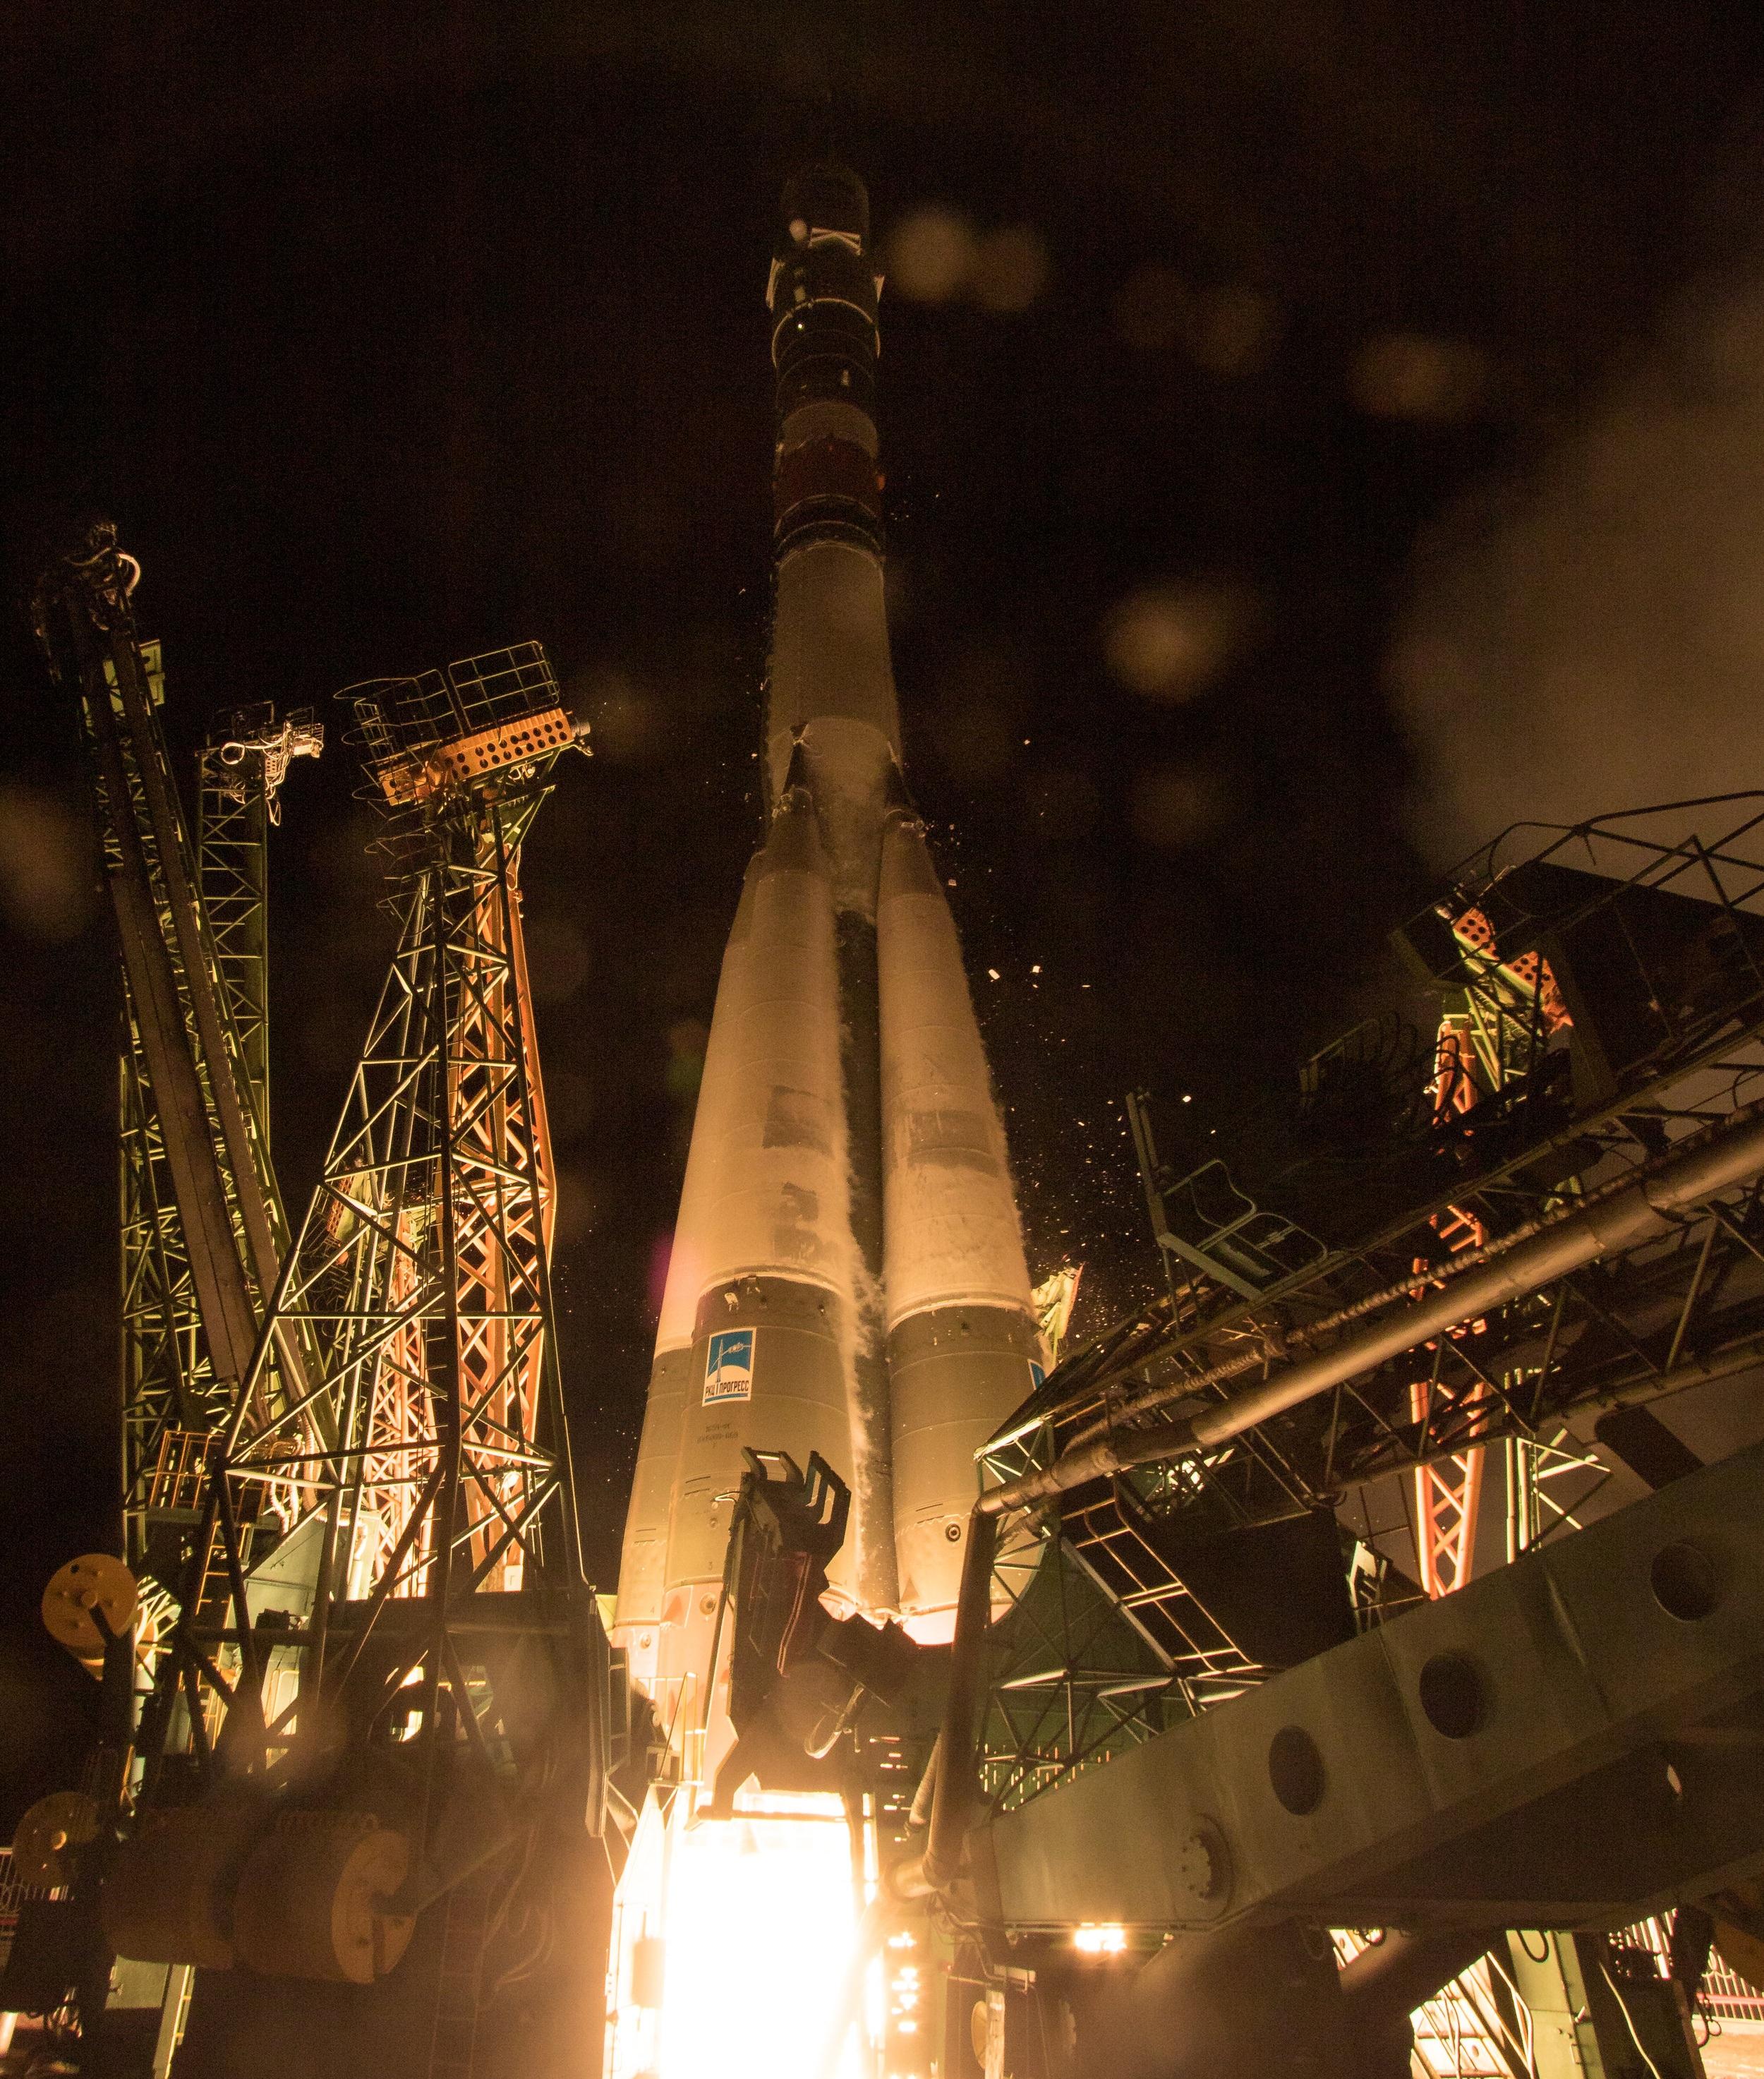 Soyuz MS-13 launches atop the Soyuz-FG rocket for its trek into orbit. NASA/Joel Kowsky